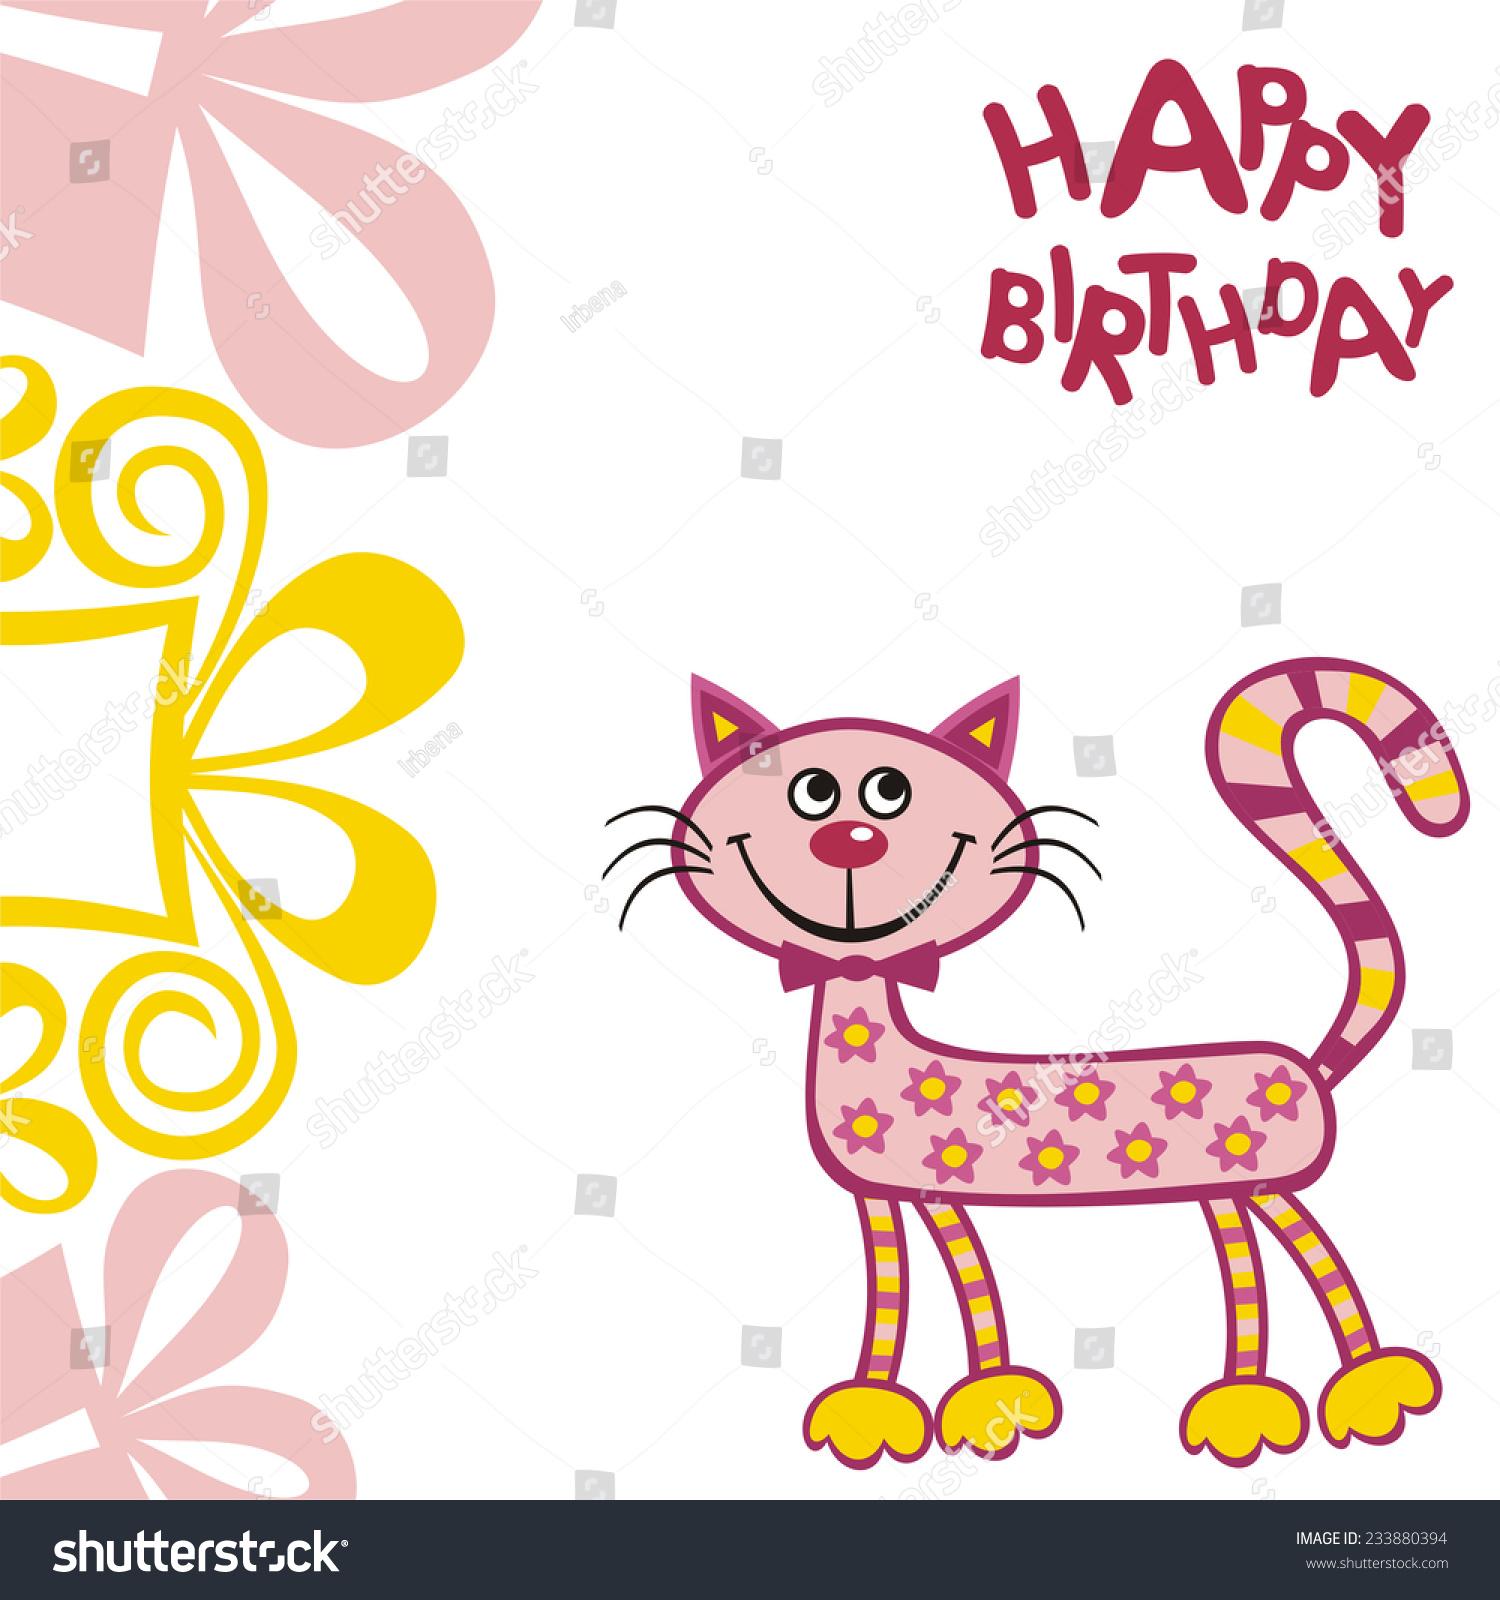 Happy birthday greeting card cat vector stock vector 233880394 happy birthday greeting card with cat vector illustration kristyandbryce Gallery